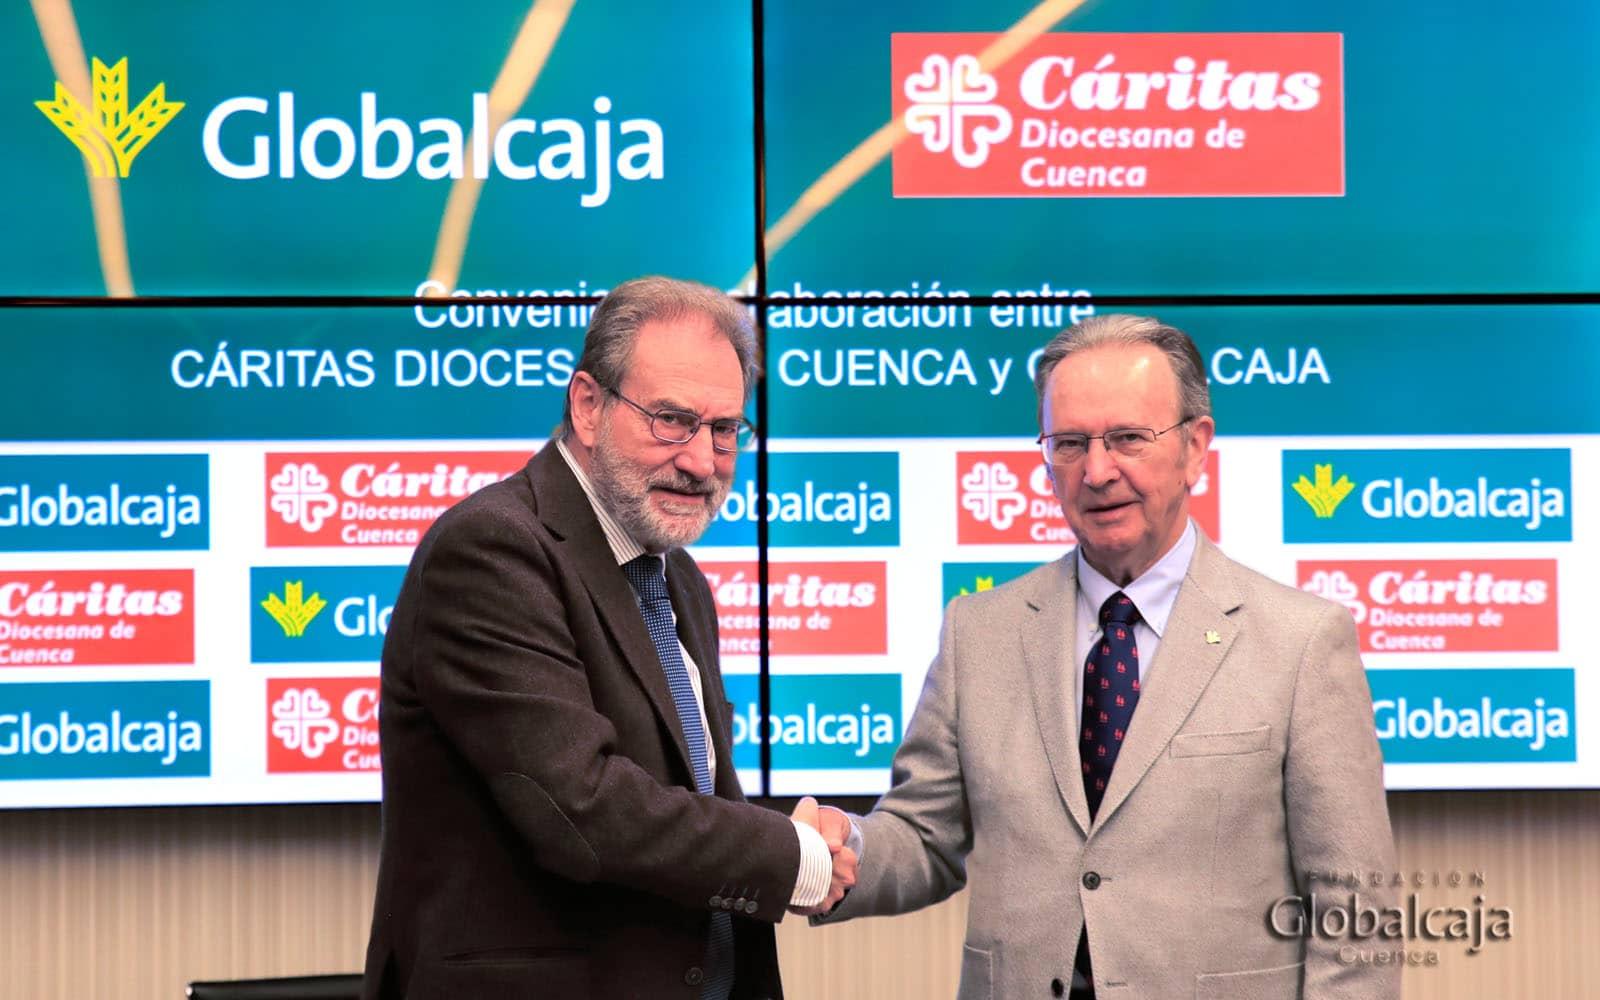 https://blog.globalcaja.es/wp-content/uploads/2018/10/MG_0785_W.jpg